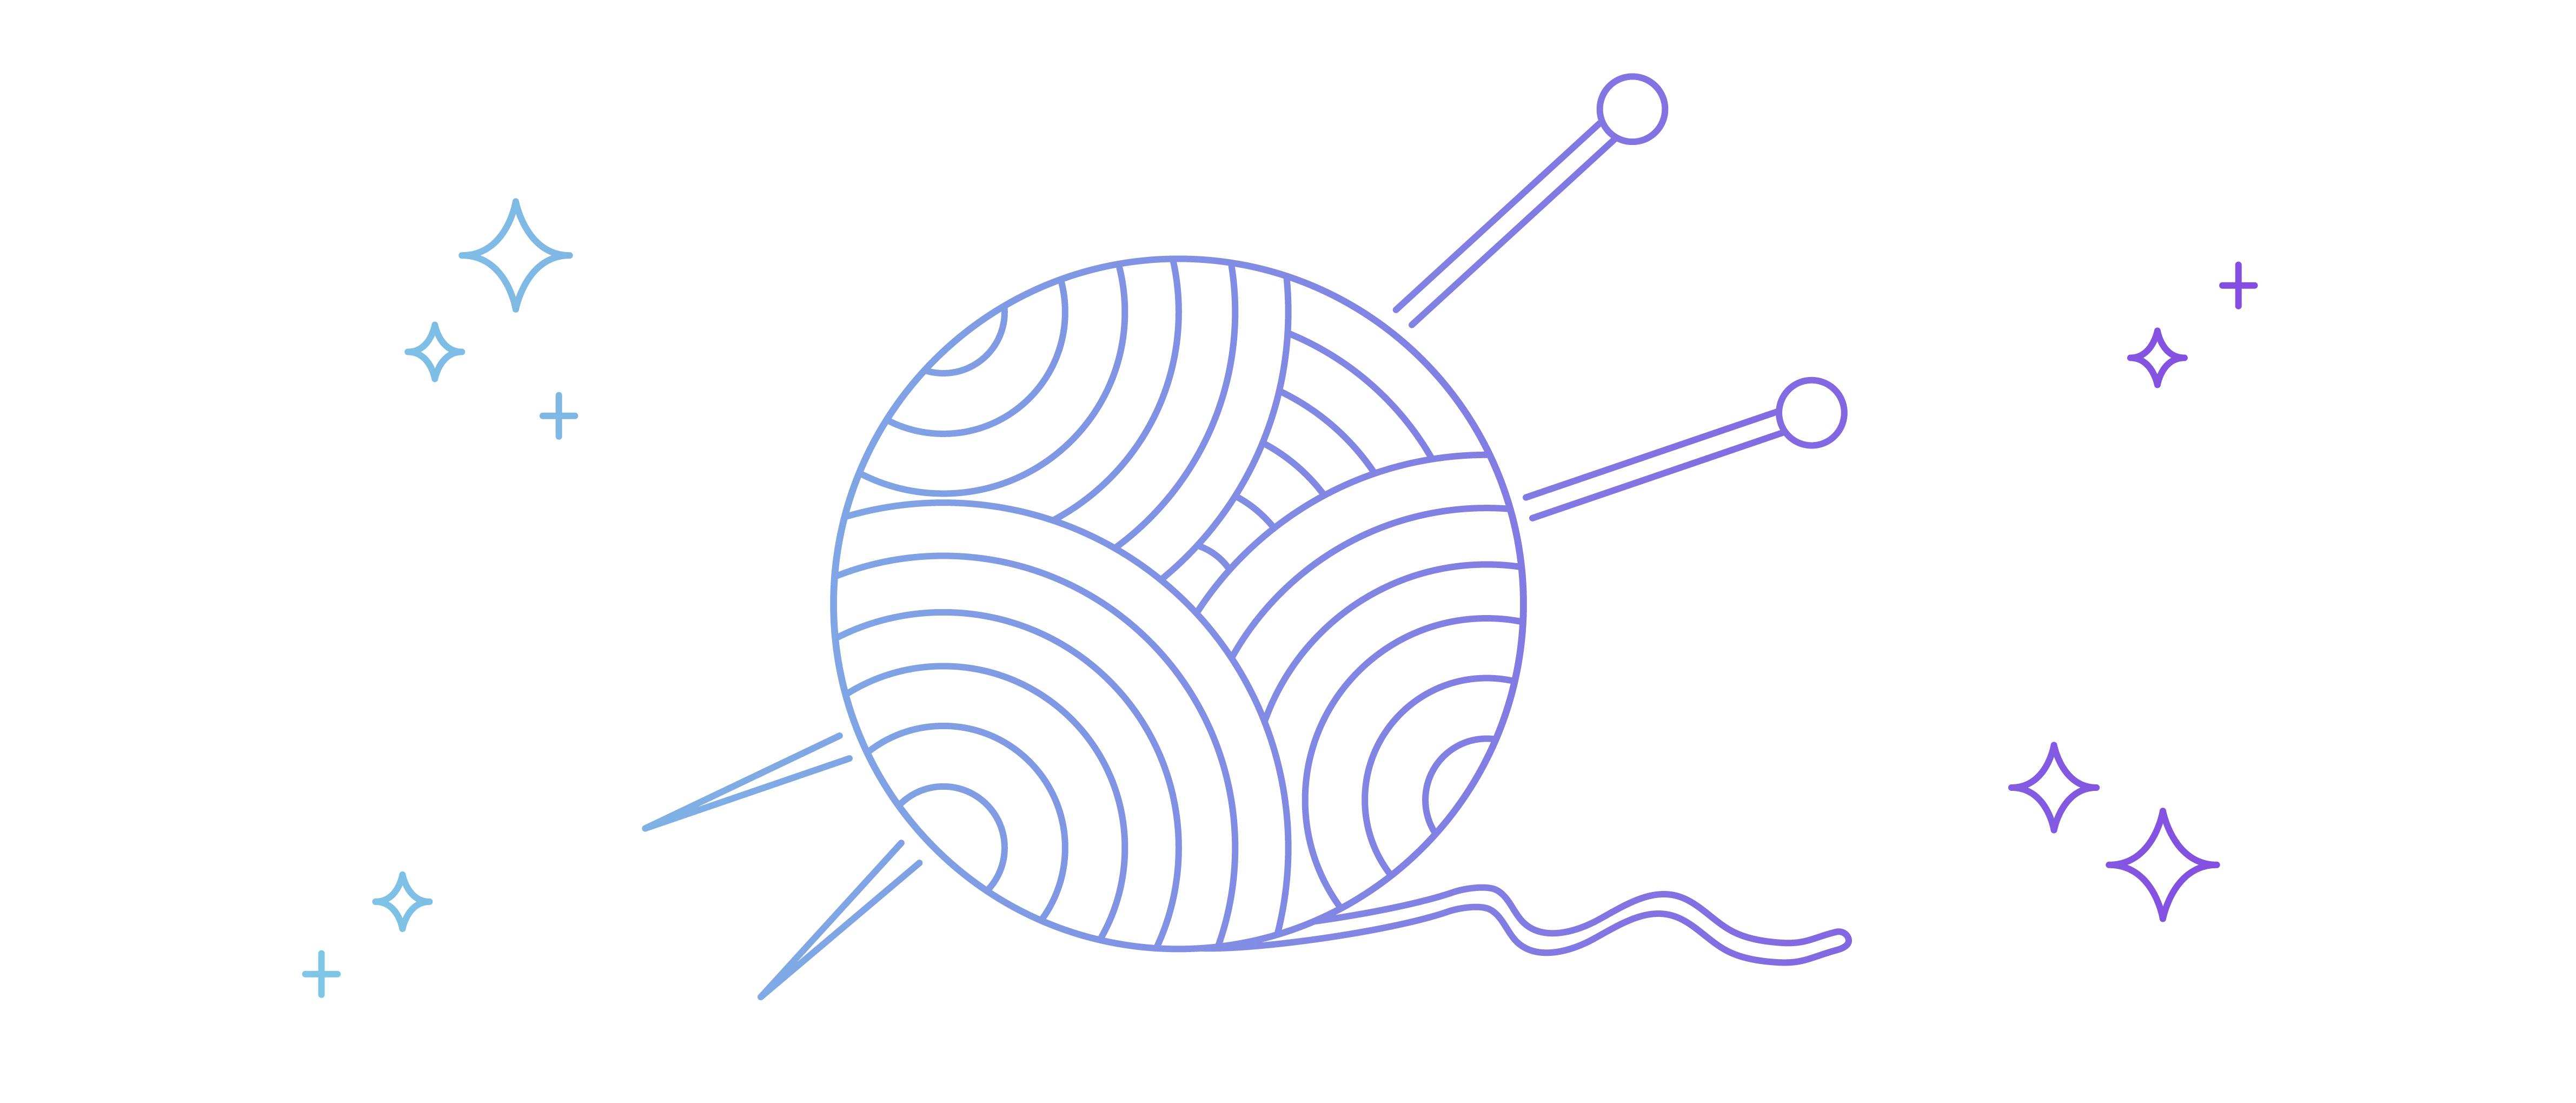 Ball of yarn and knitting needles illustration